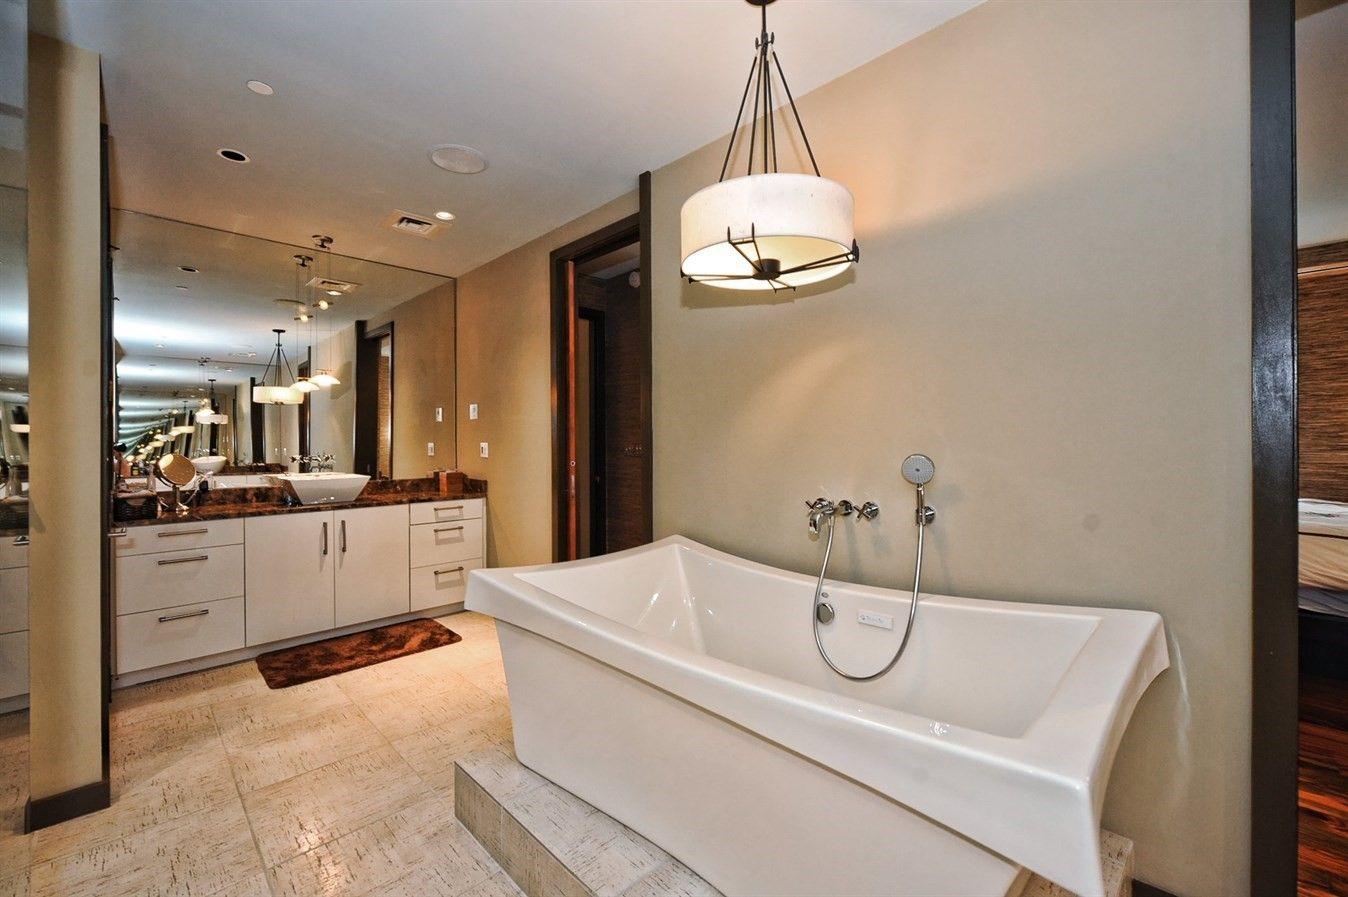 Huge bathtub in this beautiful bathroom! | Not-So-Basic Baths ...